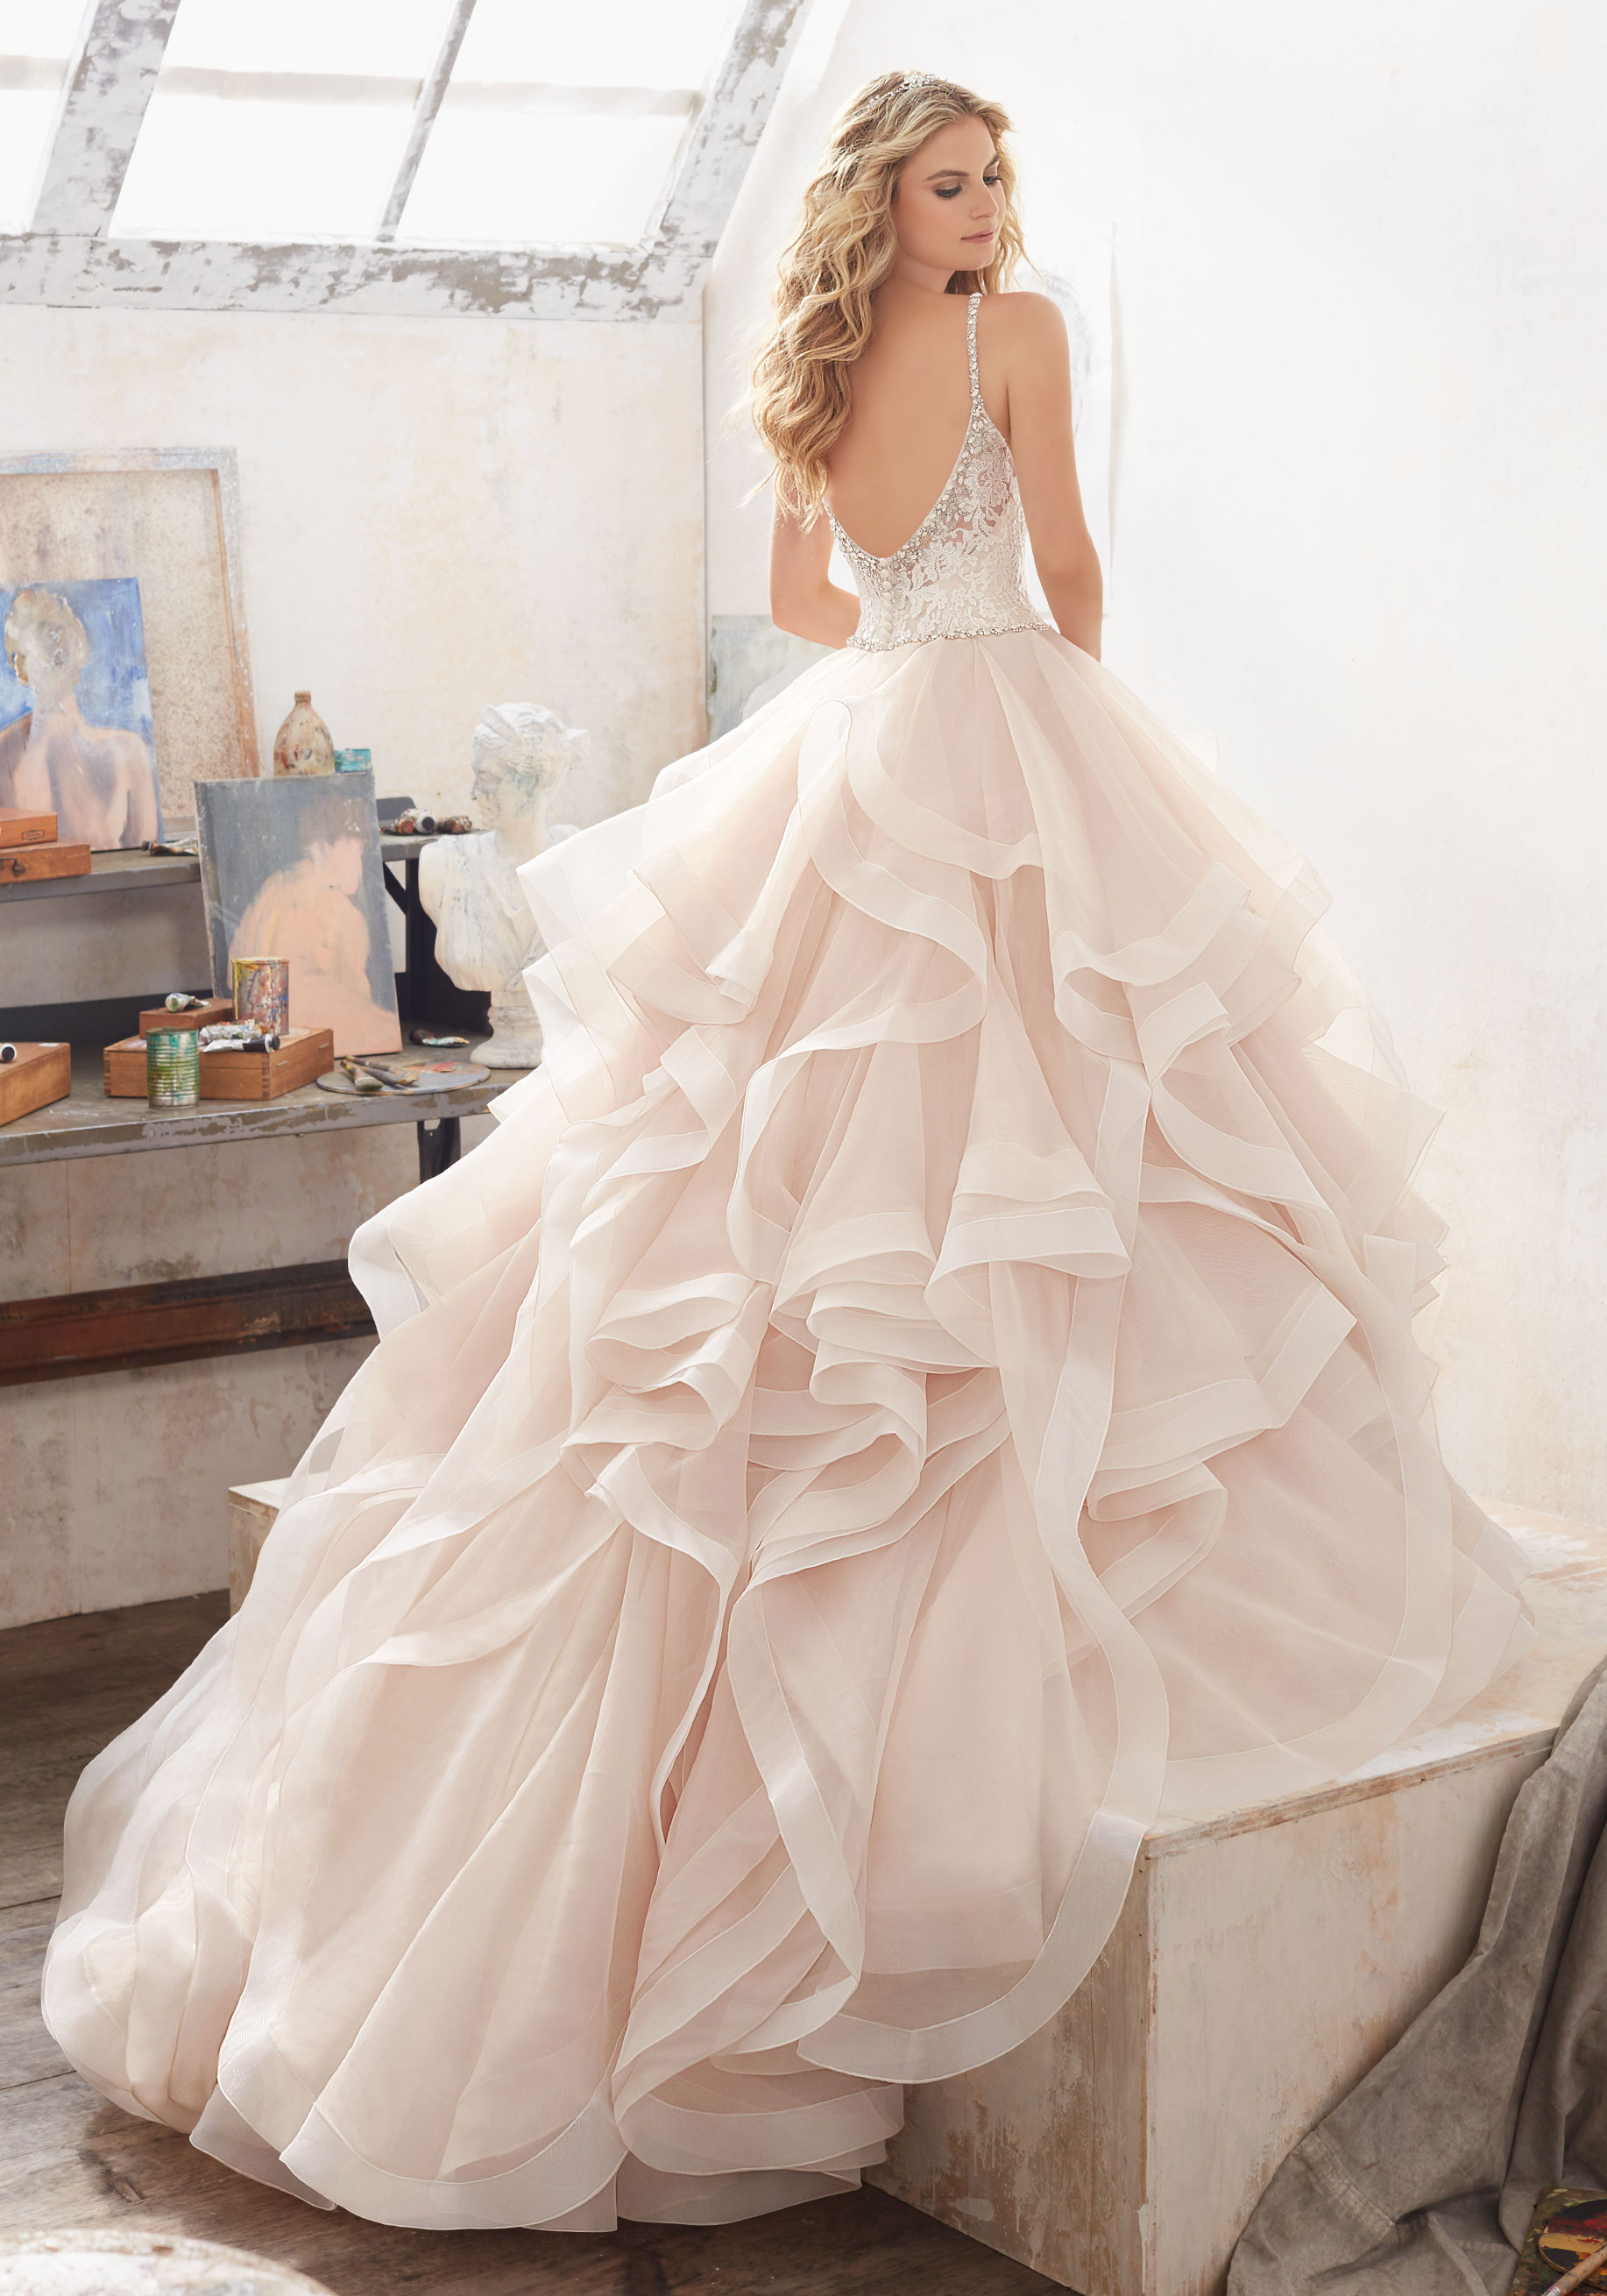 Mori Lee Wedding Dress 2603 700 Price Negotiable